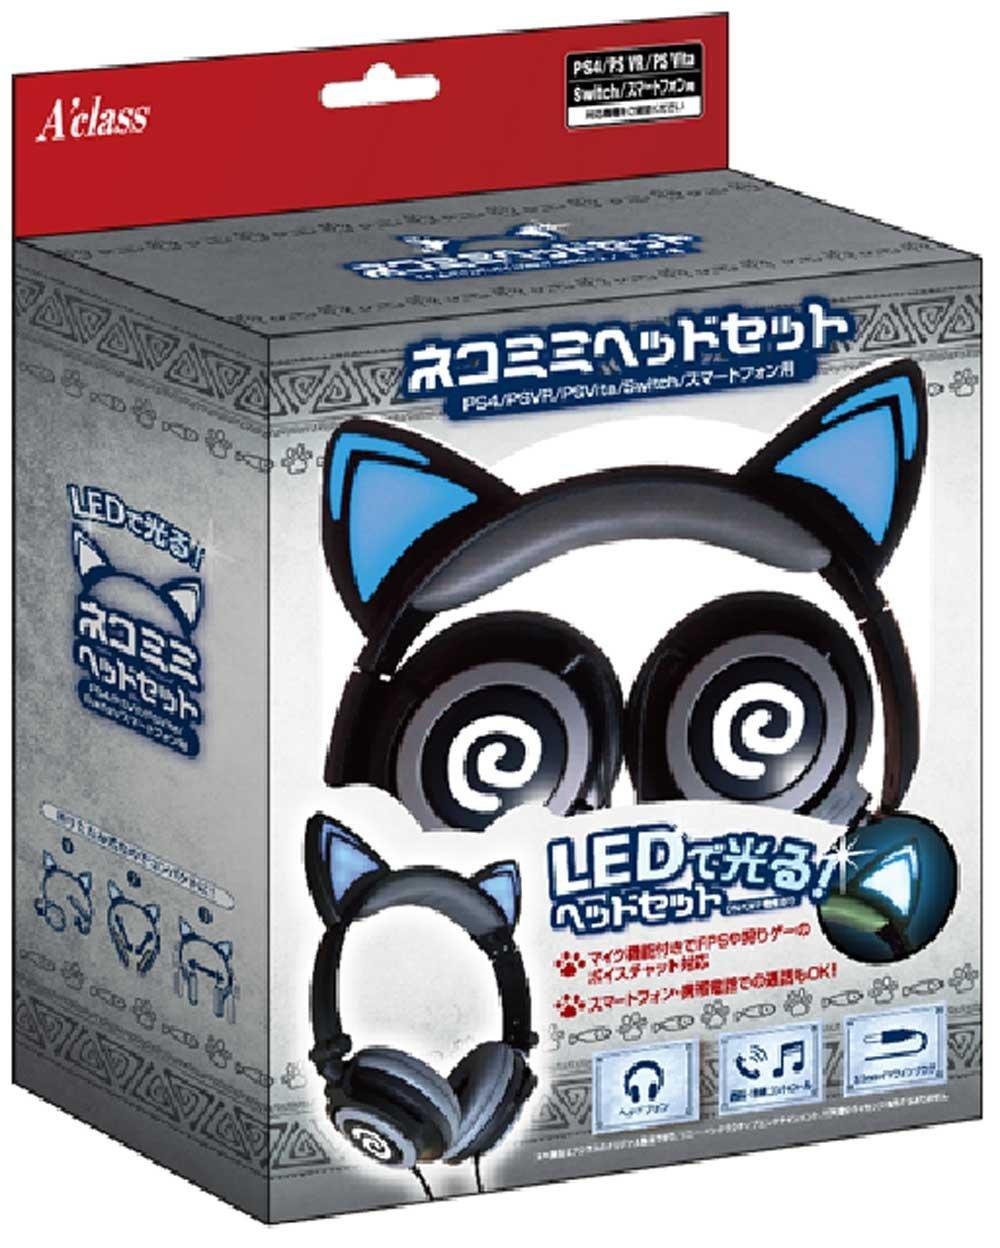 PS4/PSVR/PSVita/Switch/スマートフォン用ネコミミヘッドセット(ぐるぐる)